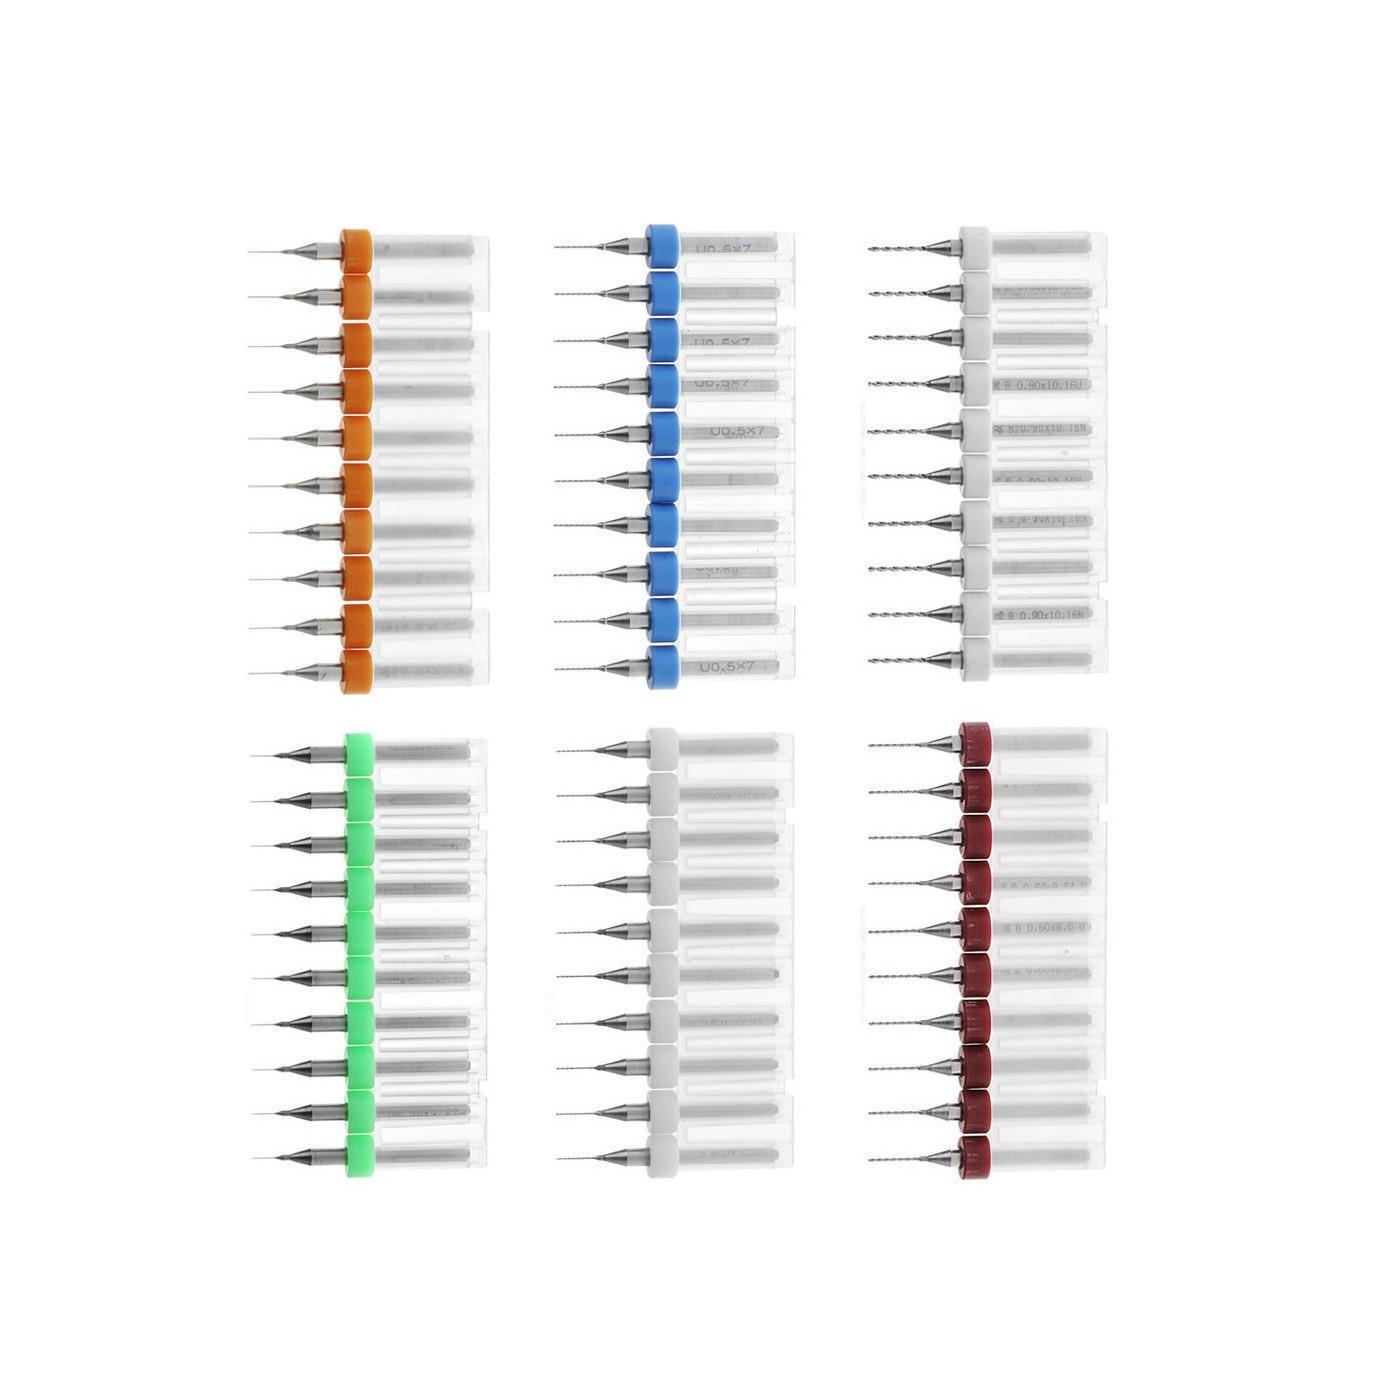 Combi set of 10 micro drill bits in box (0.25-1.15 mm)